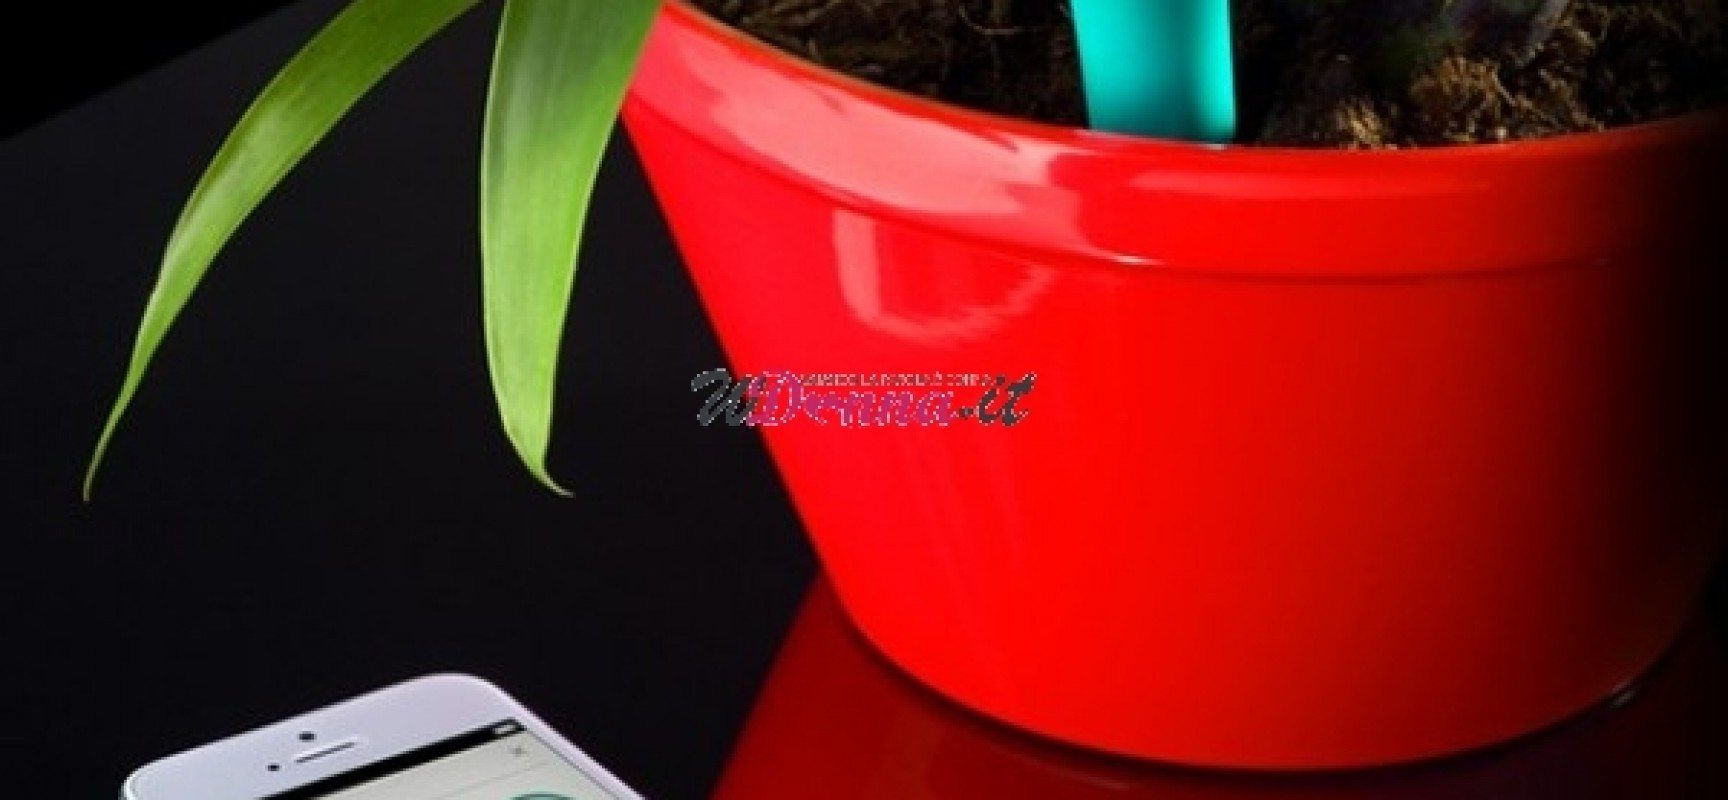 flower power un app per parlare alle piante. Black Bedroom Furniture Sets. Home Design Ideas